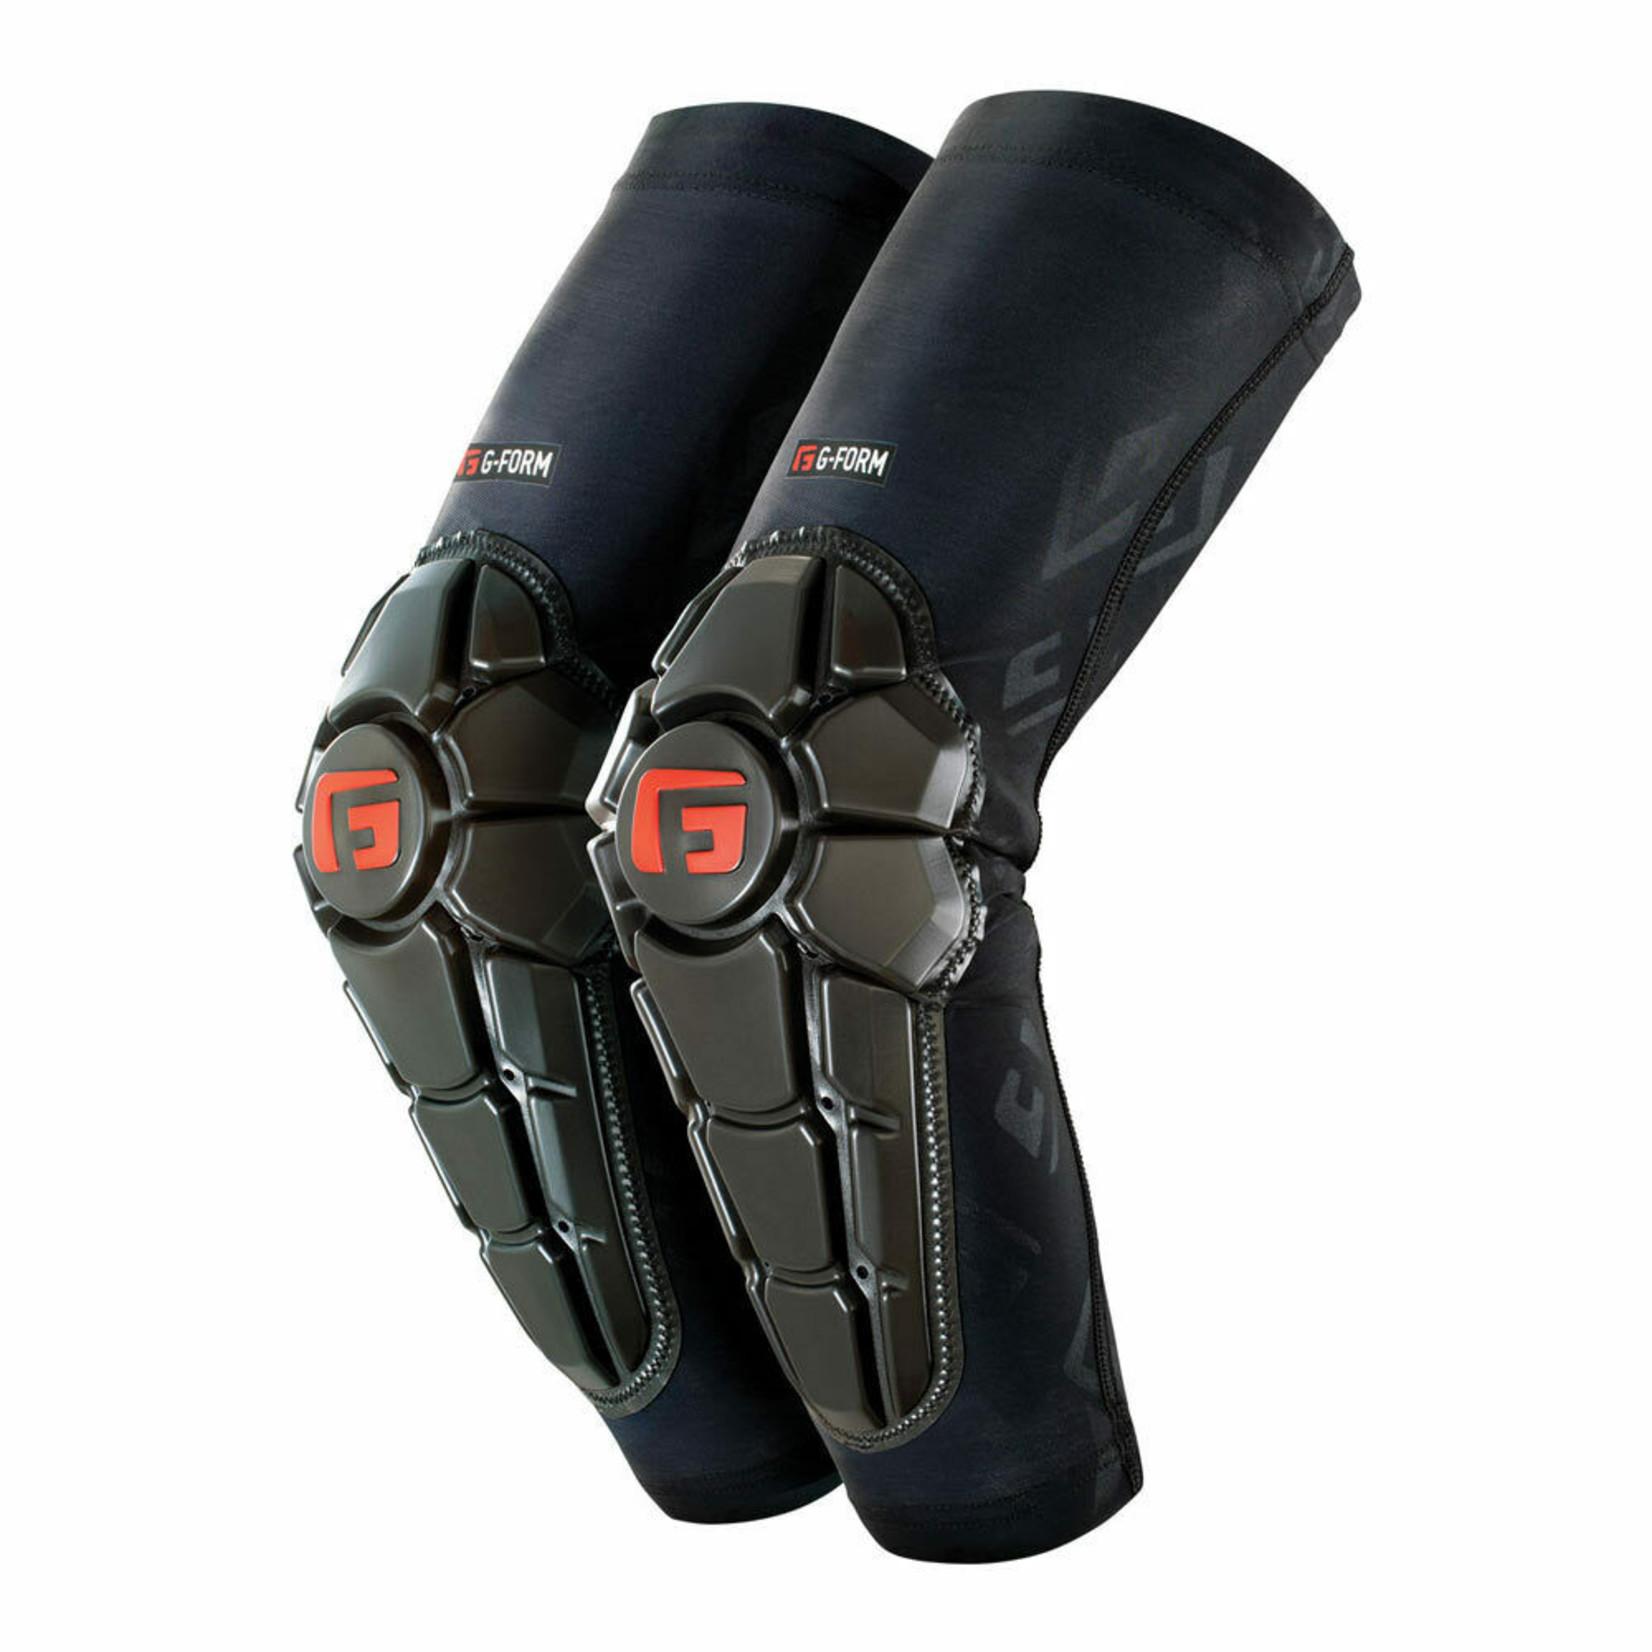 G-Form G-Form, Pro-X2, Elbow/Forearm Guard, Black, S, Set